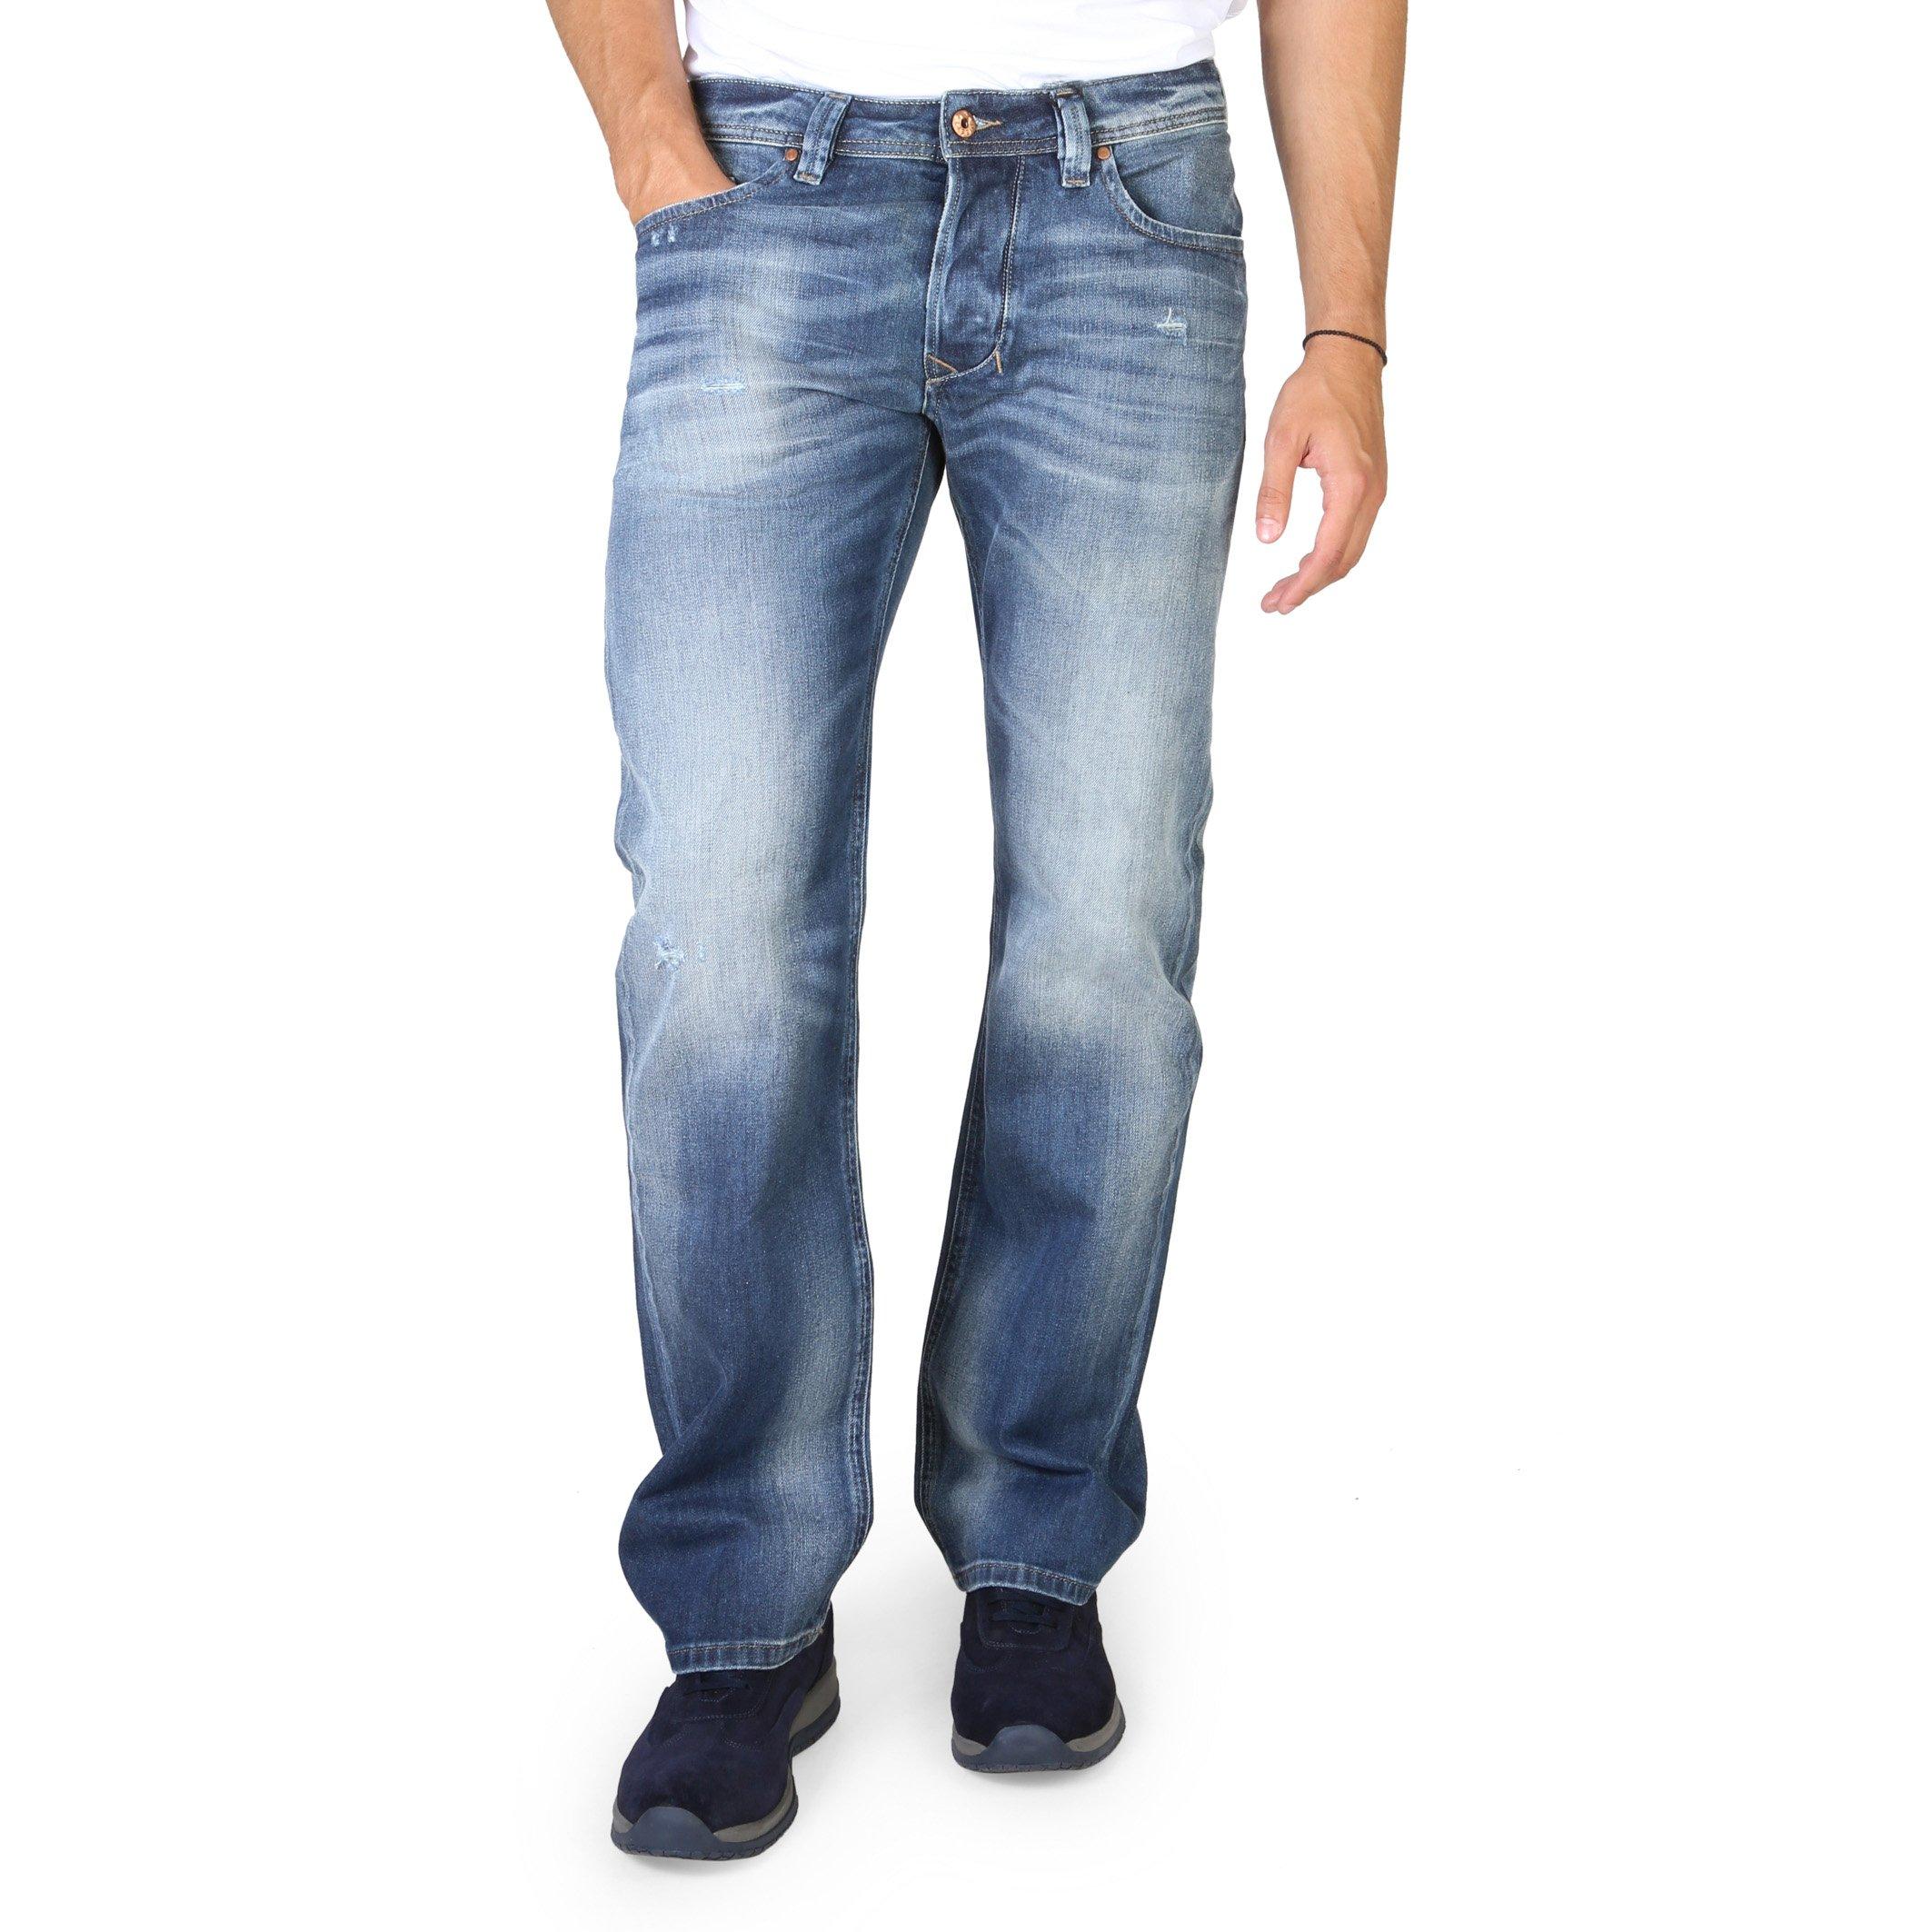 Diesel Men's Jeans Blue LARKEE_L32 - blue-2 29